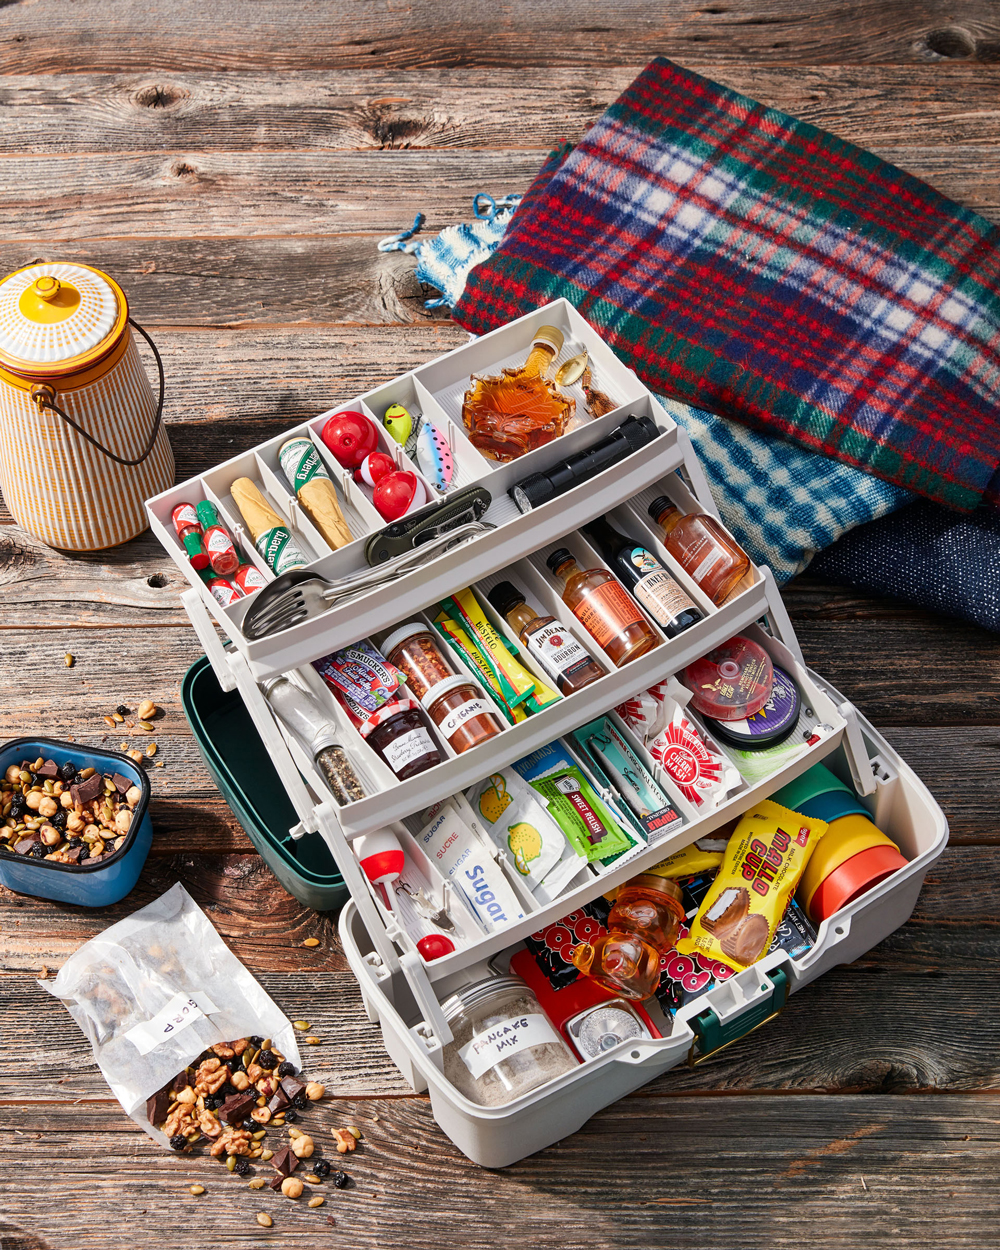 tackle box pantry on picnic table